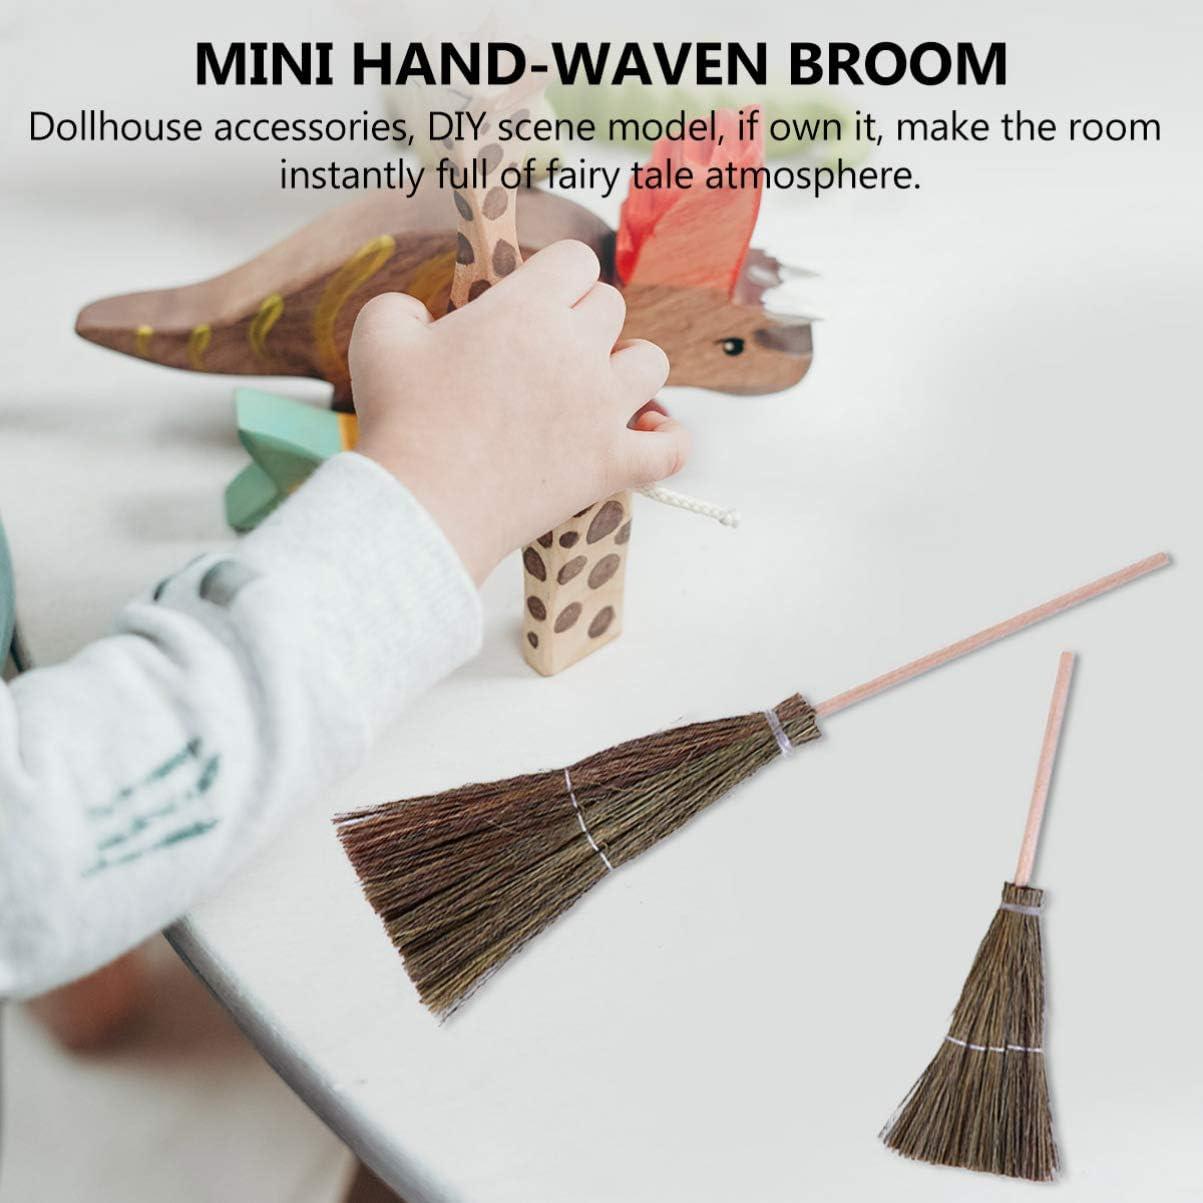 NUOBESTY 2pcs Mini Dollhouse Brooms Wood Straw Broom Craft Decoration Miniature Witch Broom Decoration Dollhouse Mini Room Scenery Layout